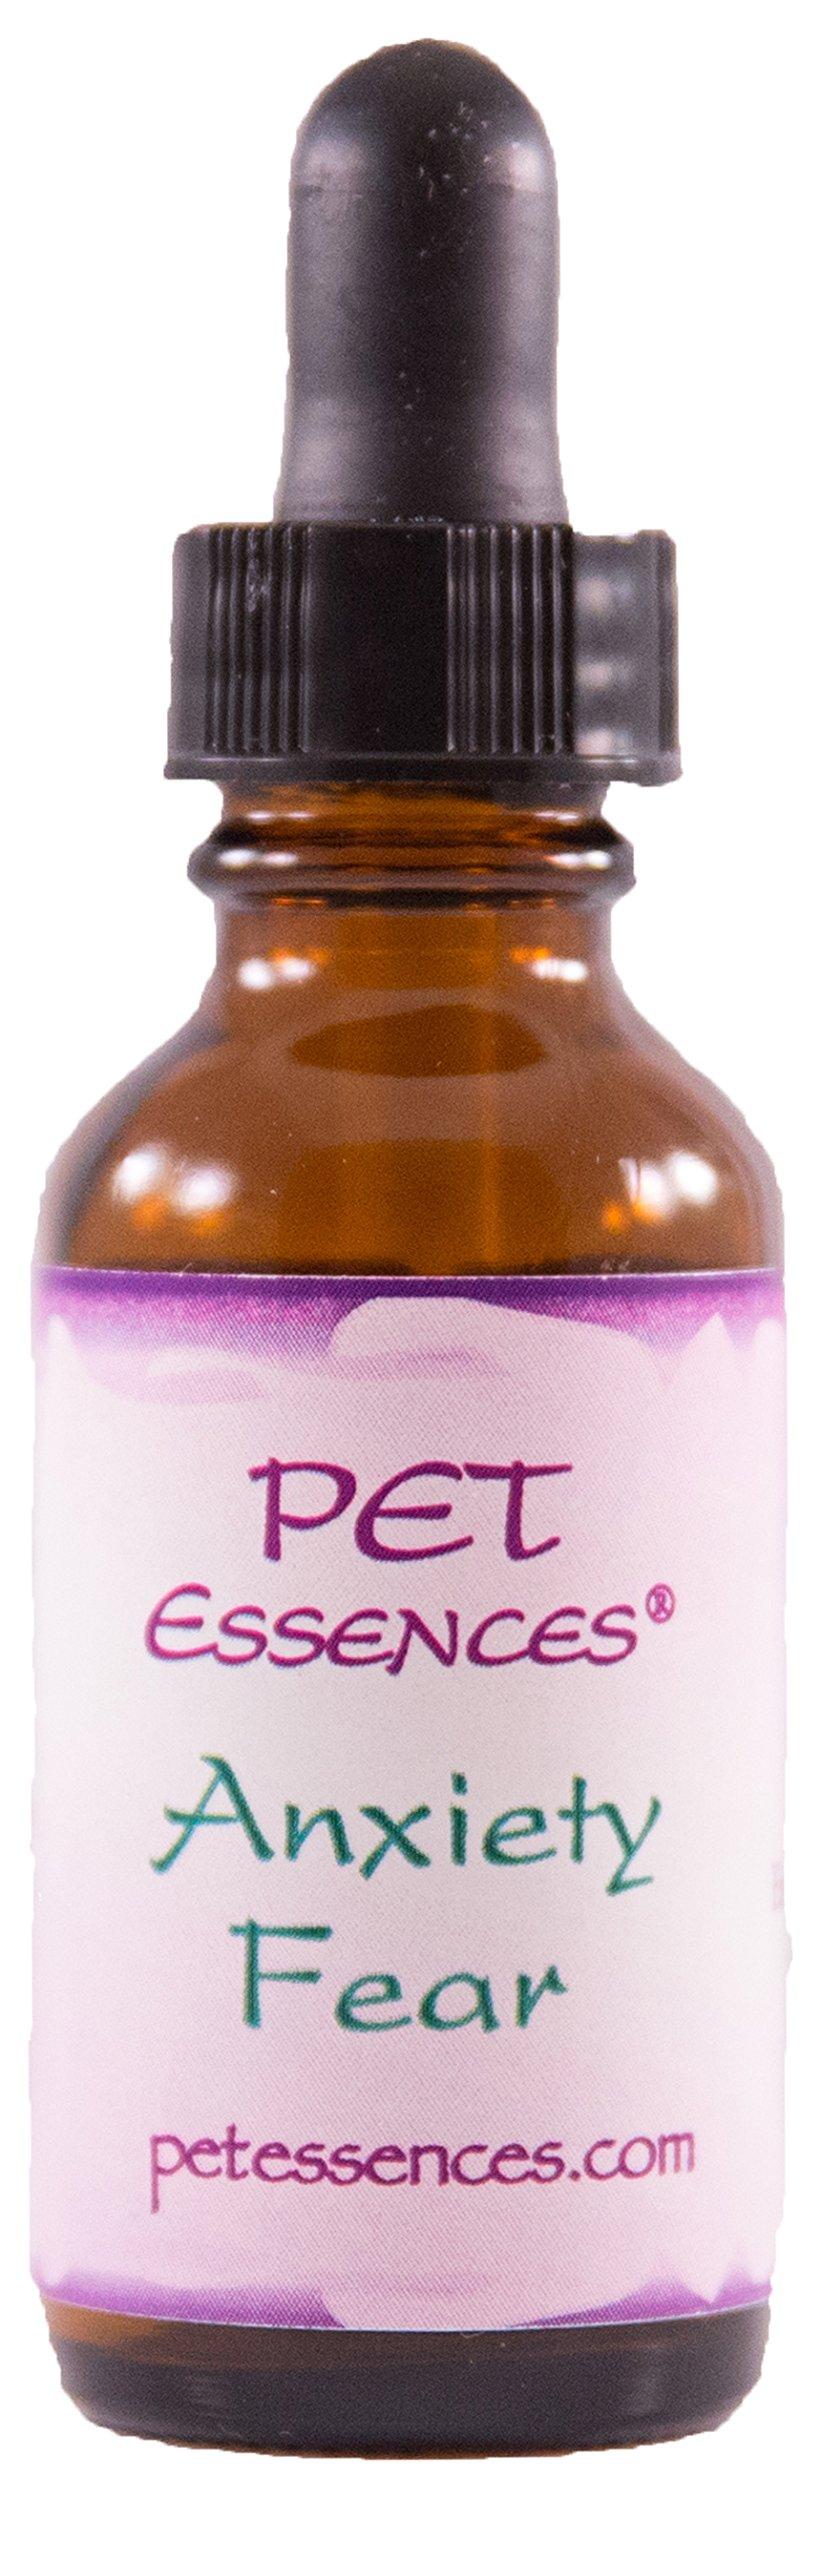 Pet Essences Anxiety / Fear